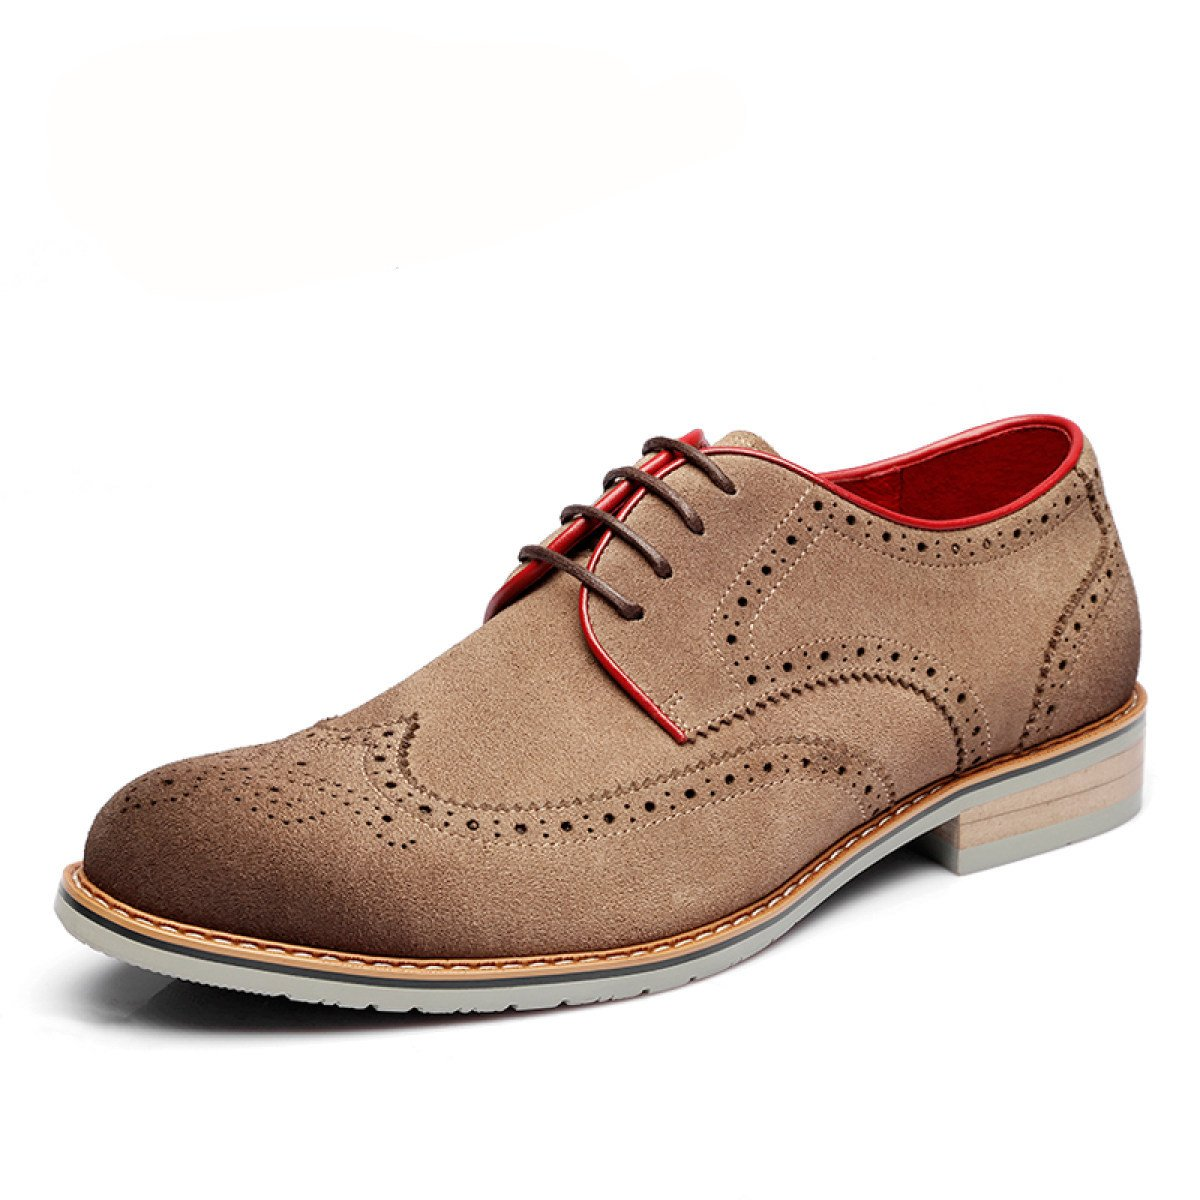 GRRONG Herren Brock Geschnitzt Tauml;gliche Beilauml;ufige Schuhe Trend-Schuhe  44|Khaki